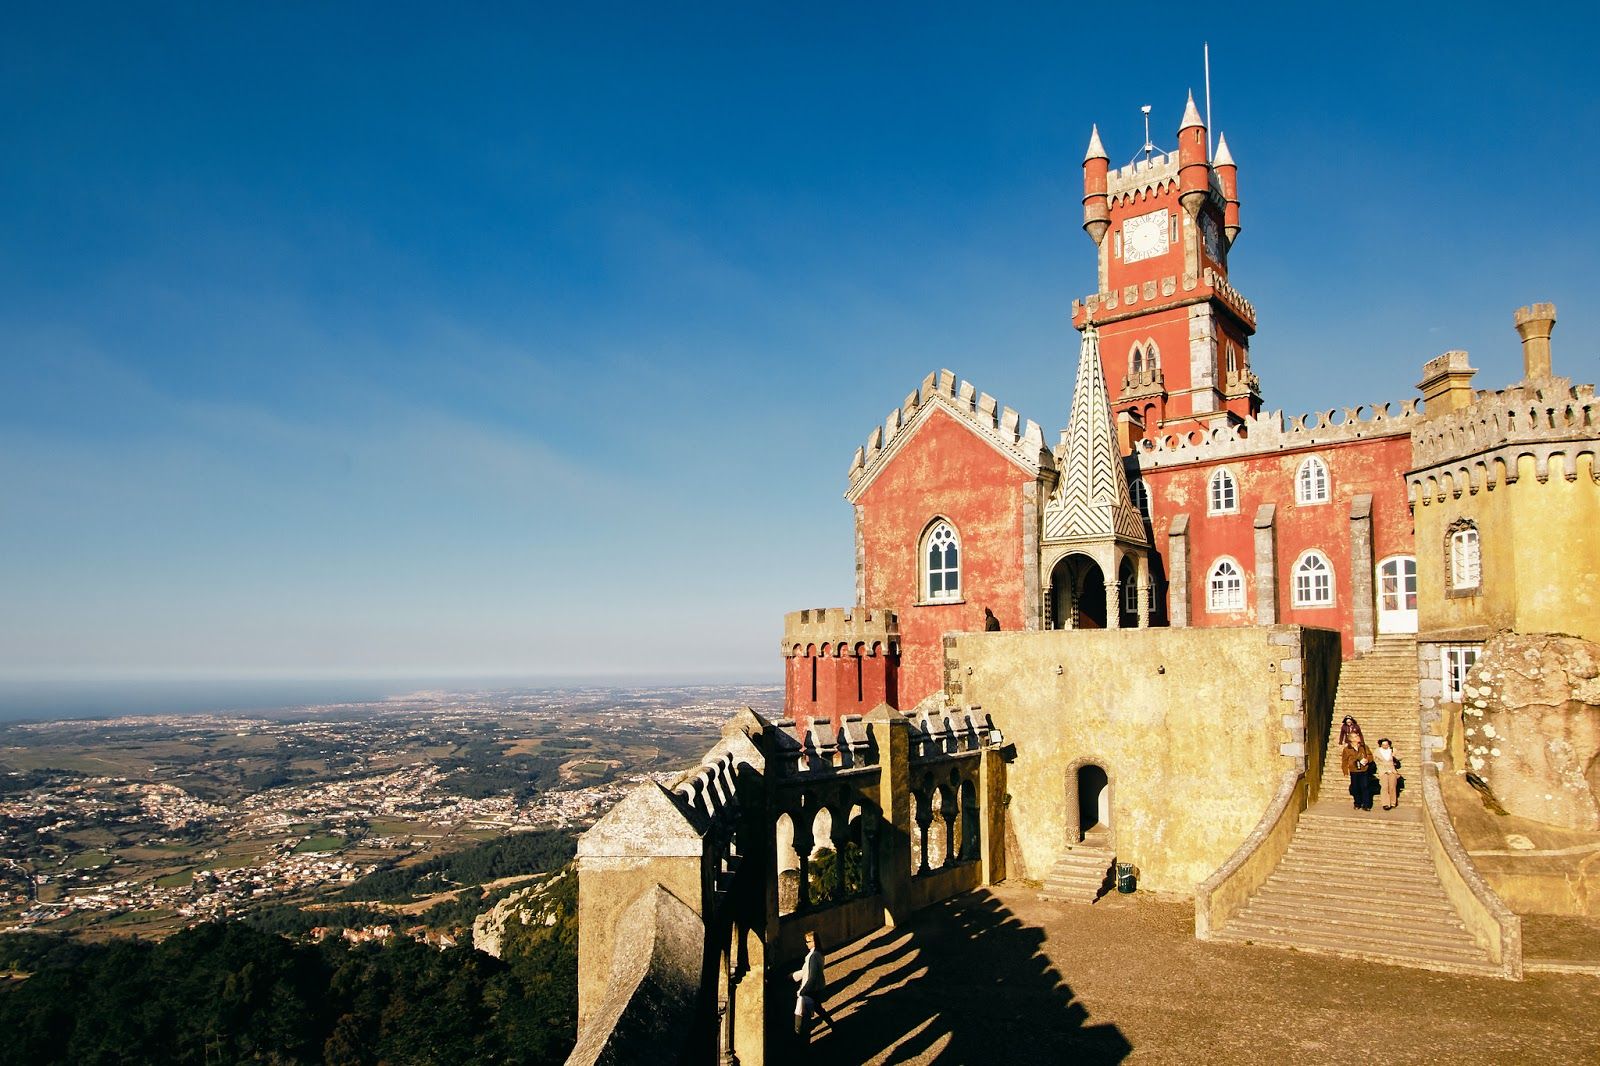 Sintra castle by Pedro Szekely